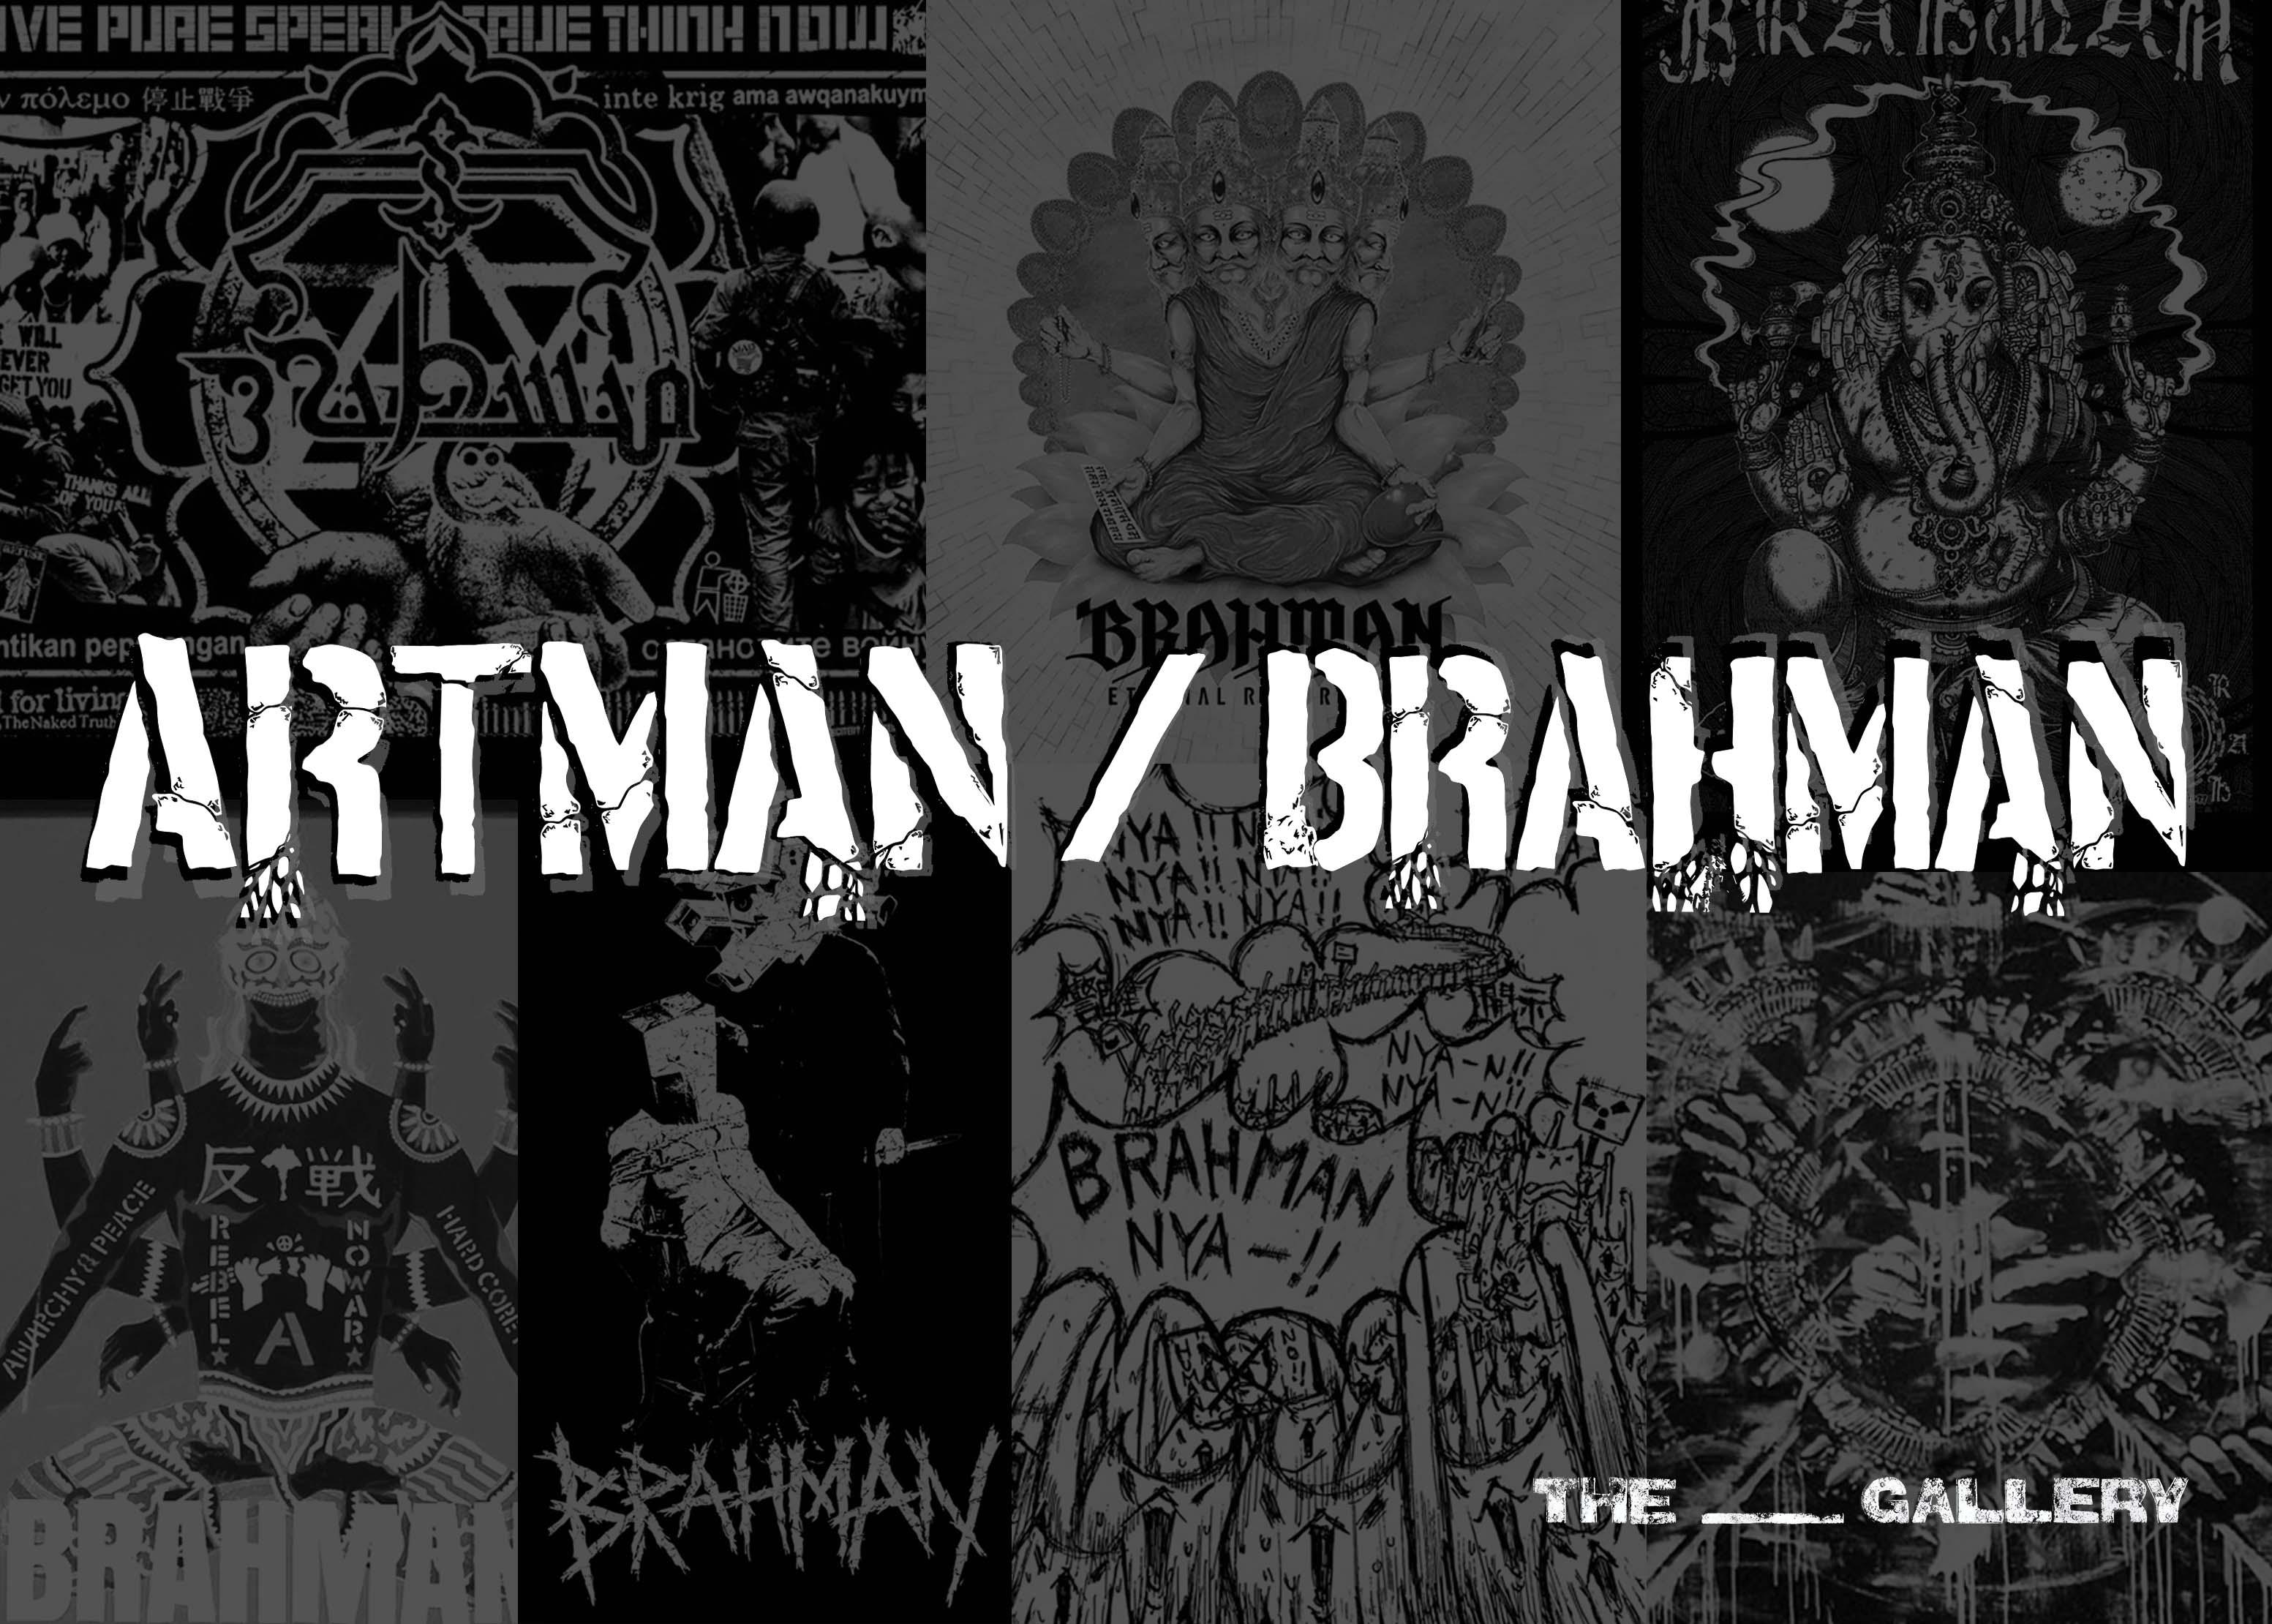 artman-brahman-flyer-front.jpg